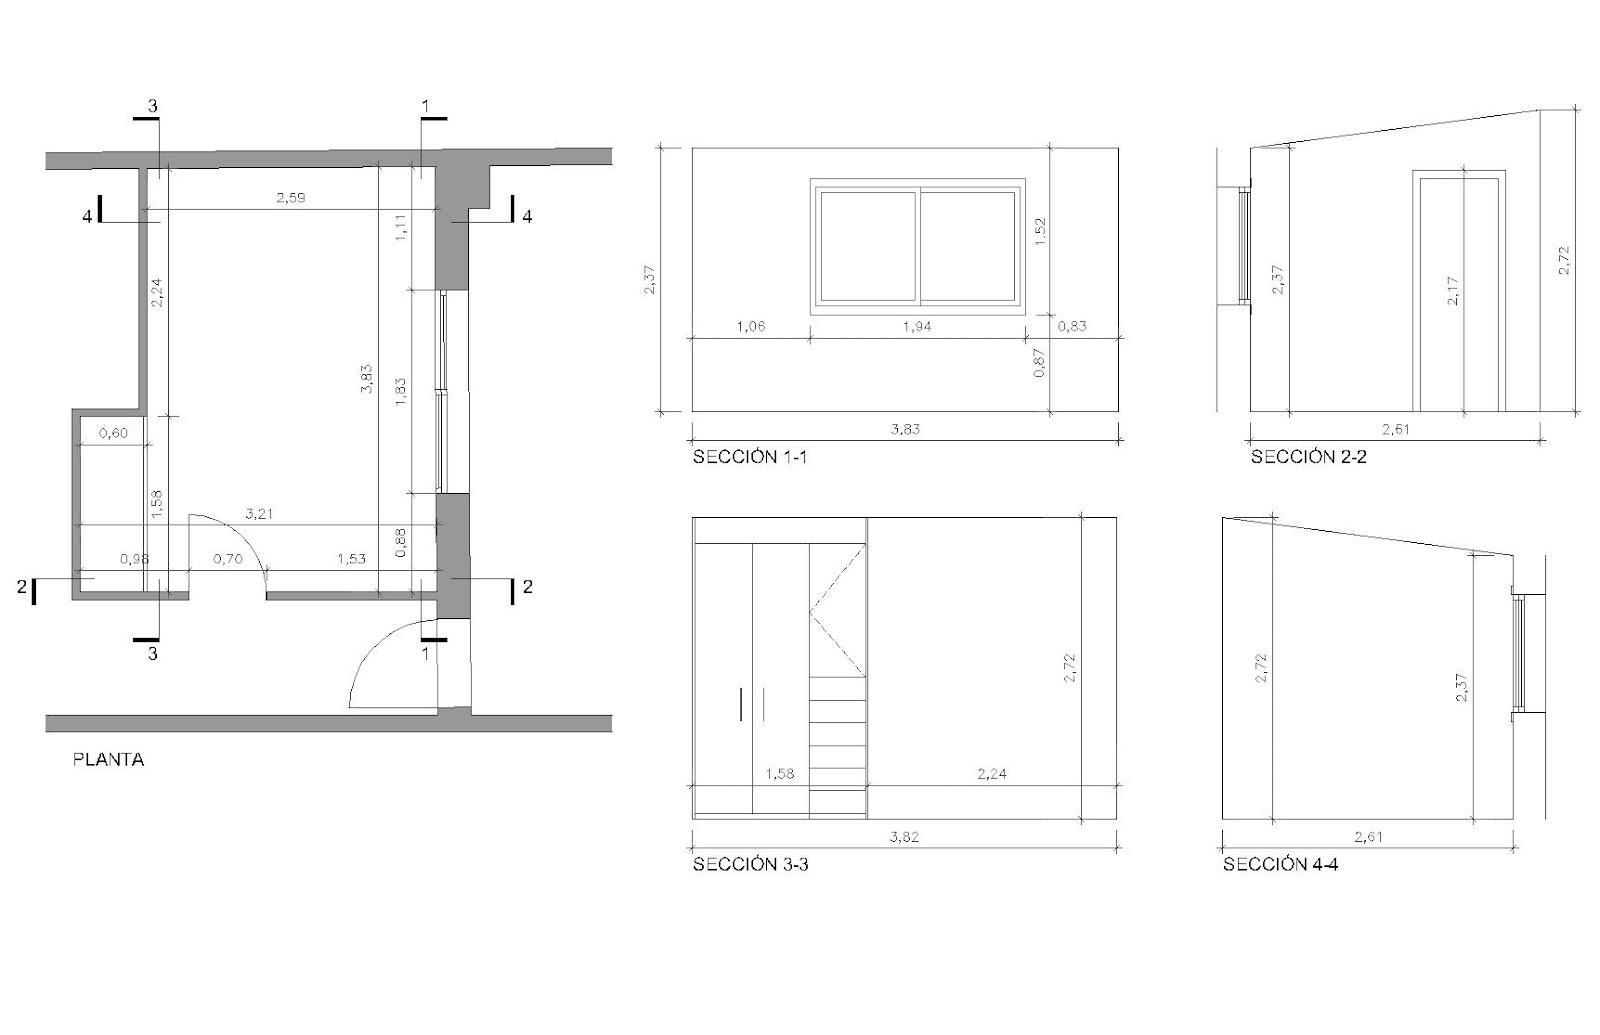 Estudio de arquitectura emearq distribuye una habitaci n Disenar habitacion ikea